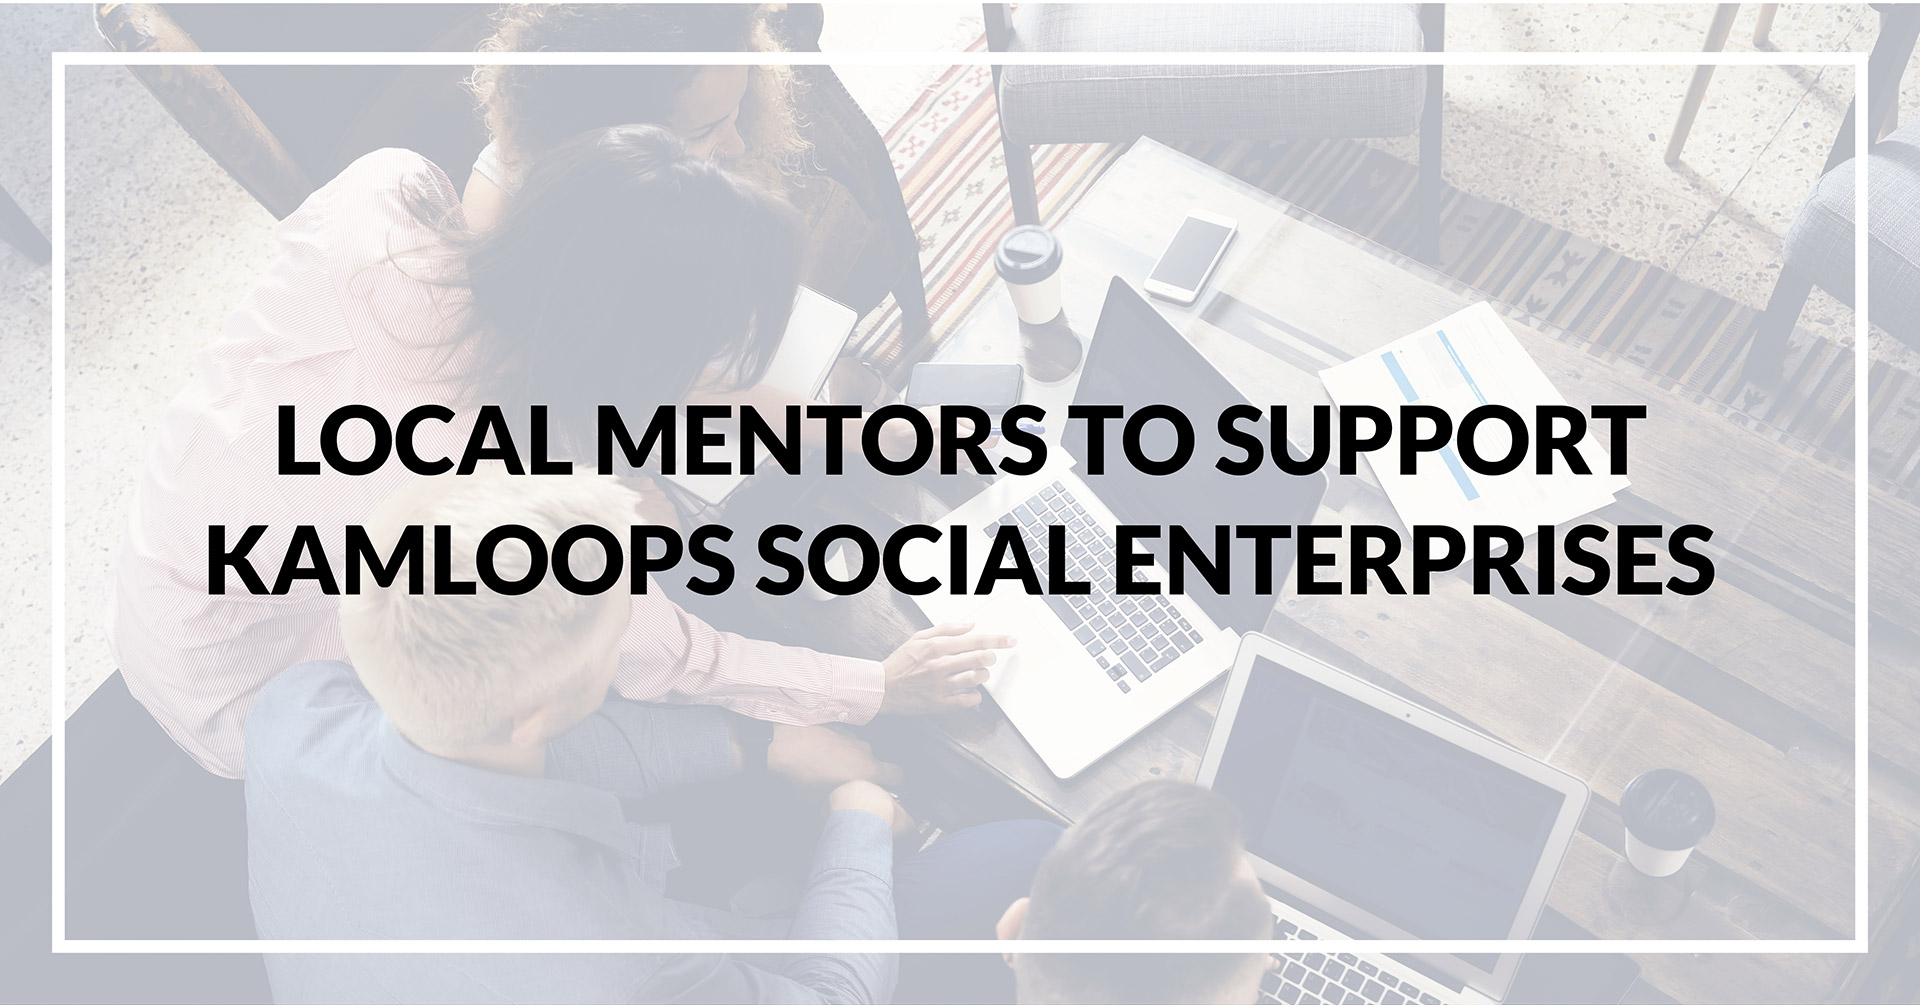 Local Mentors to Support Kamloops Social Enterprises